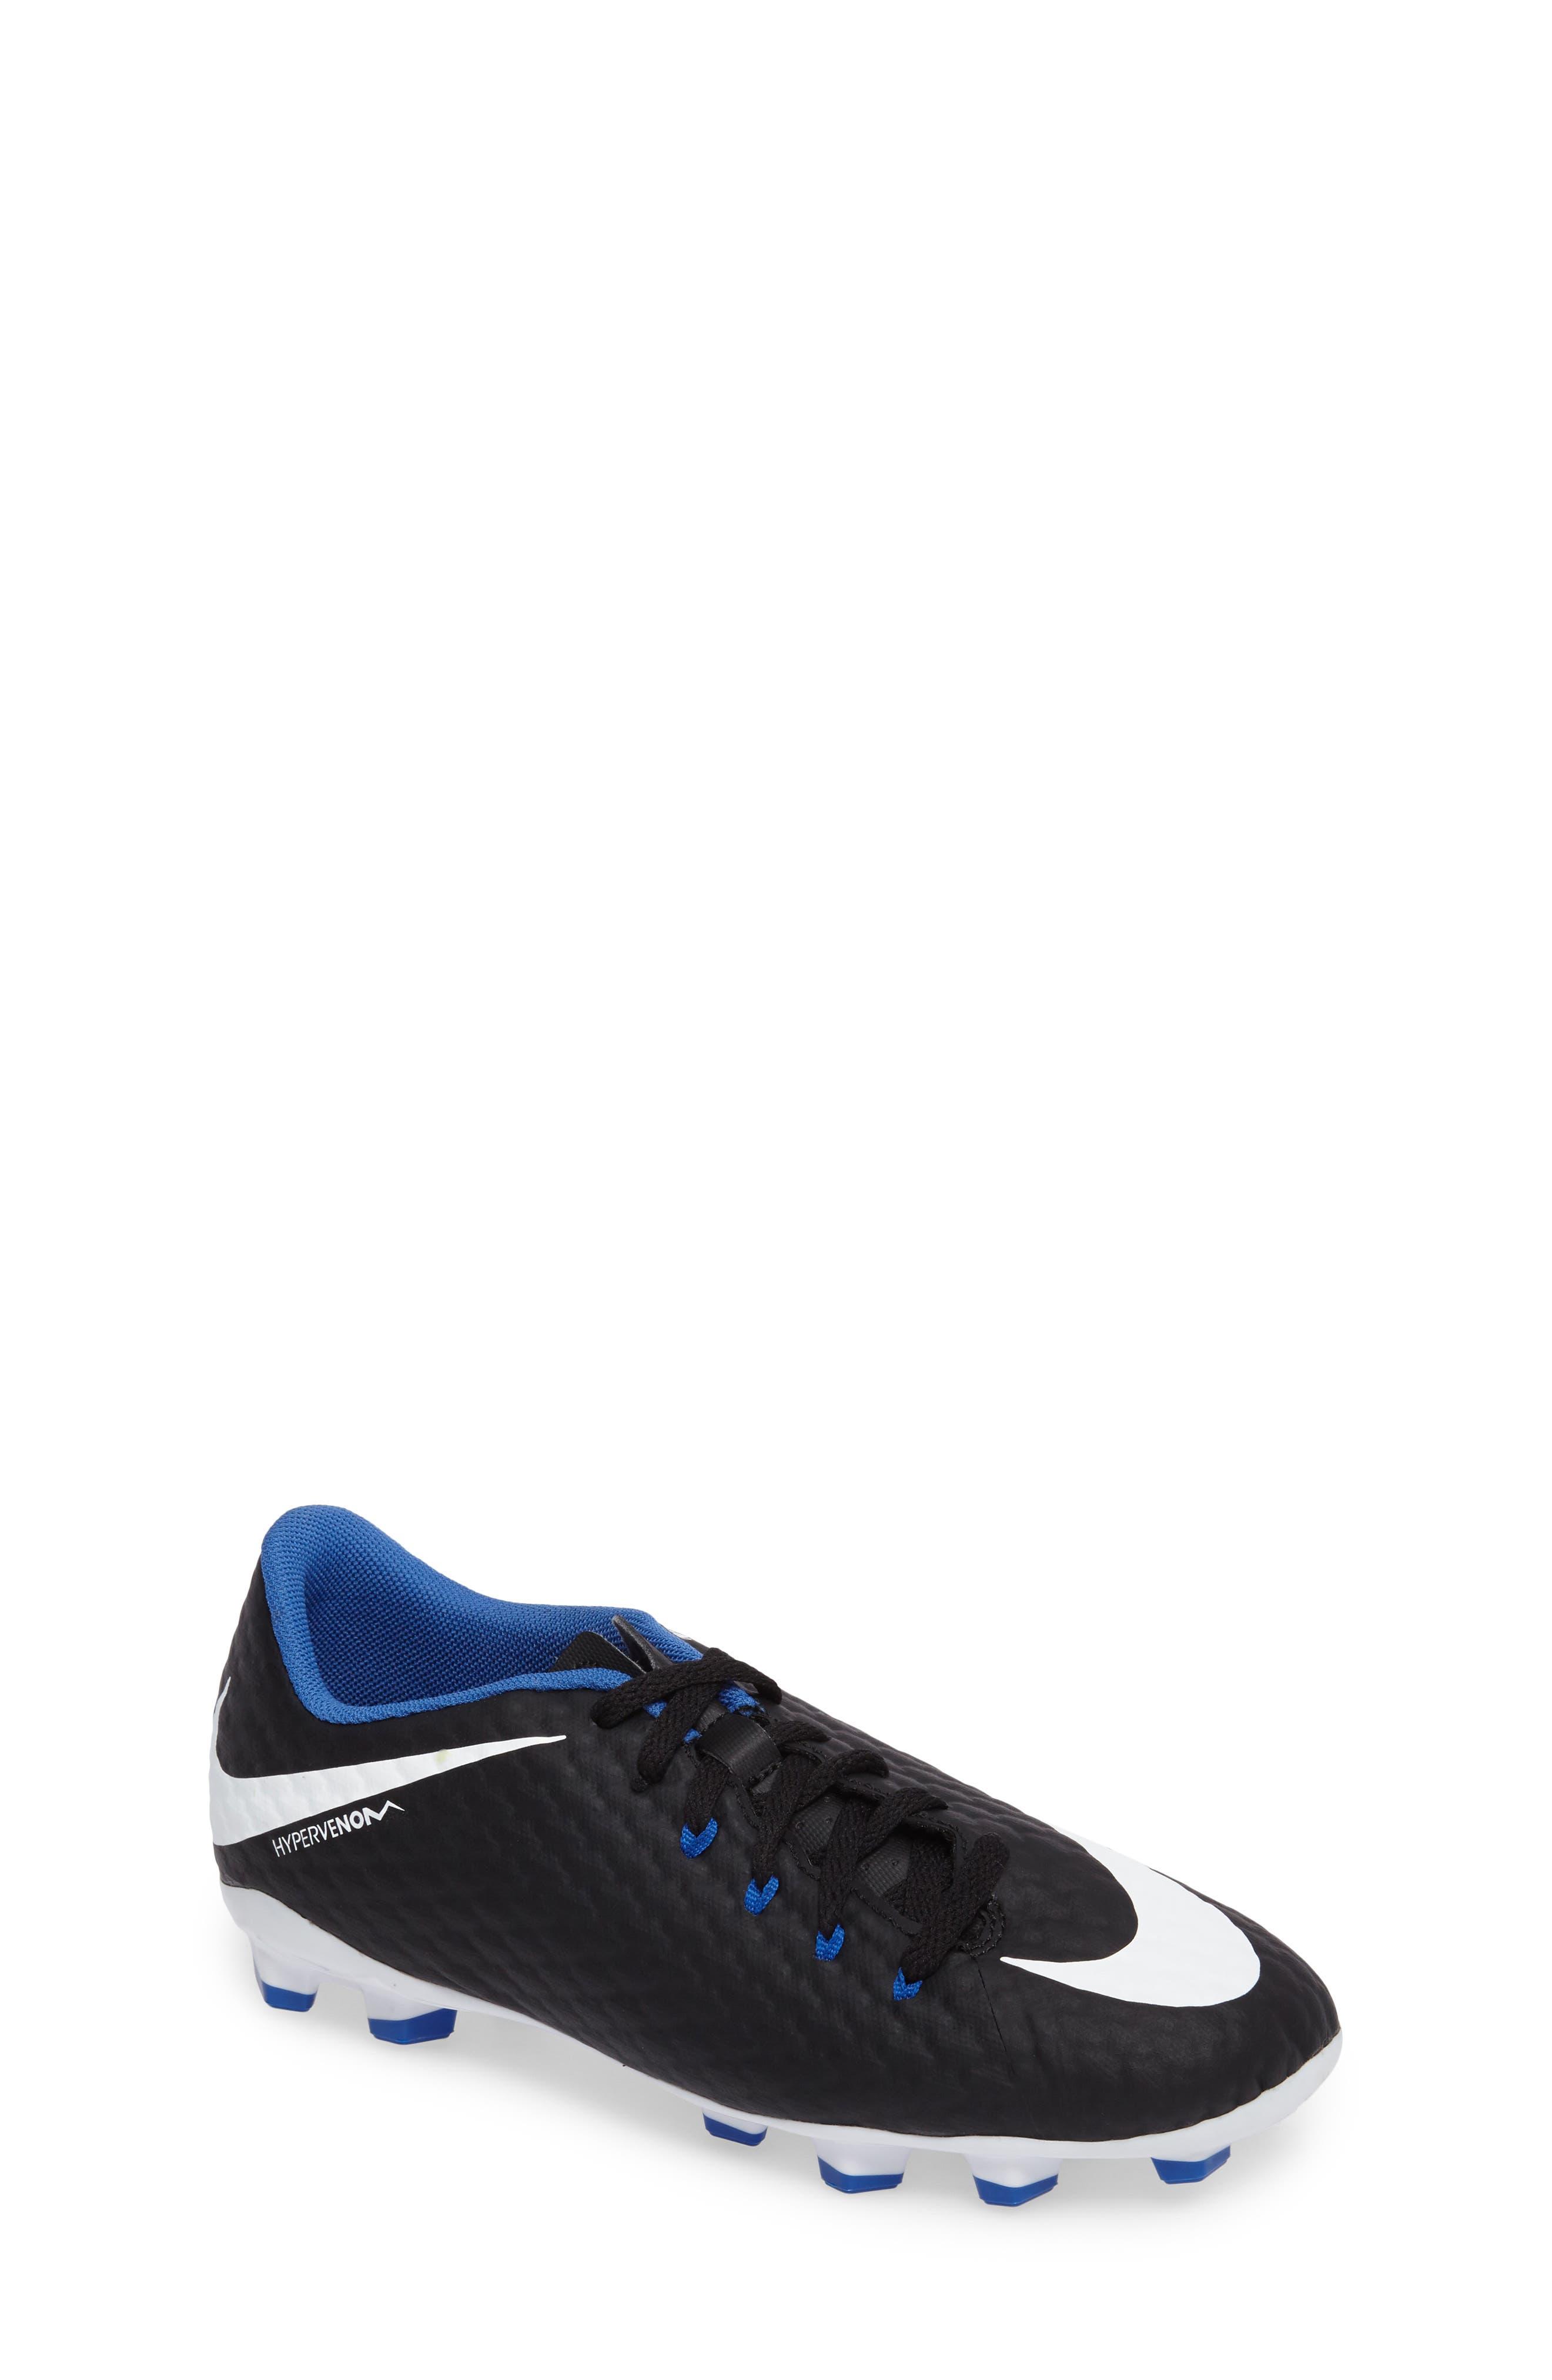 Nike Hypervenom Phelon III Firm-Ground Soccer Cleat (Toddler, Little Kid & Big Kid)